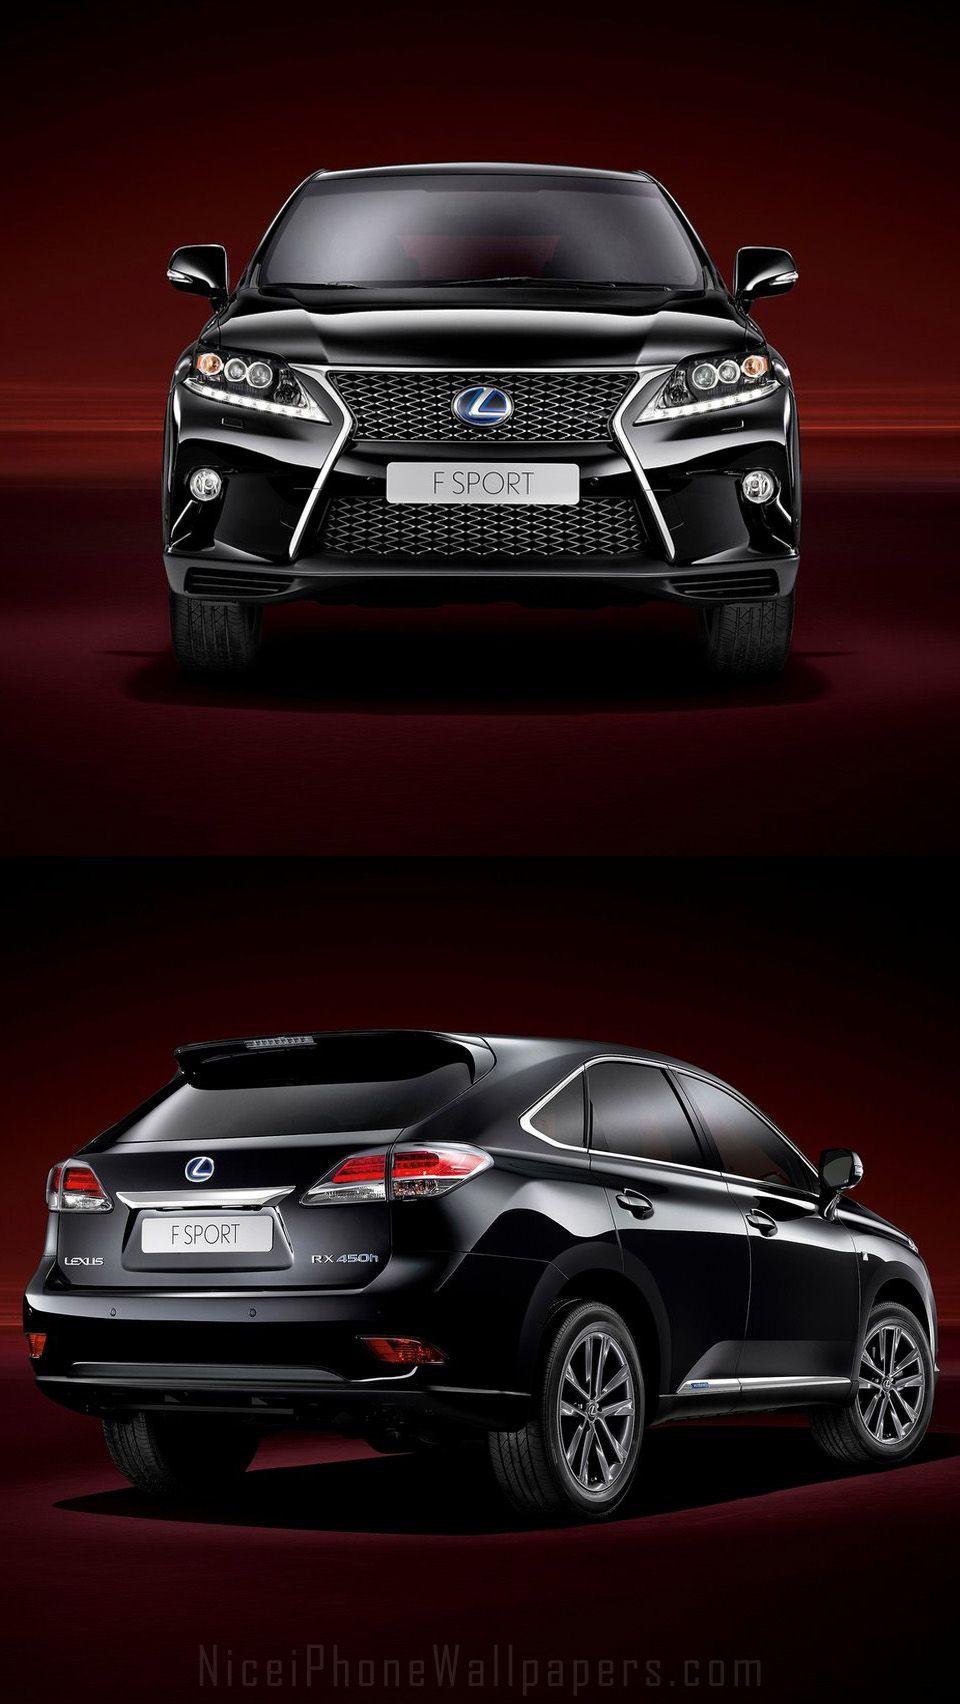 Lexus Rx 450h 2013 Iphone 6 6 Plus Wallpaper